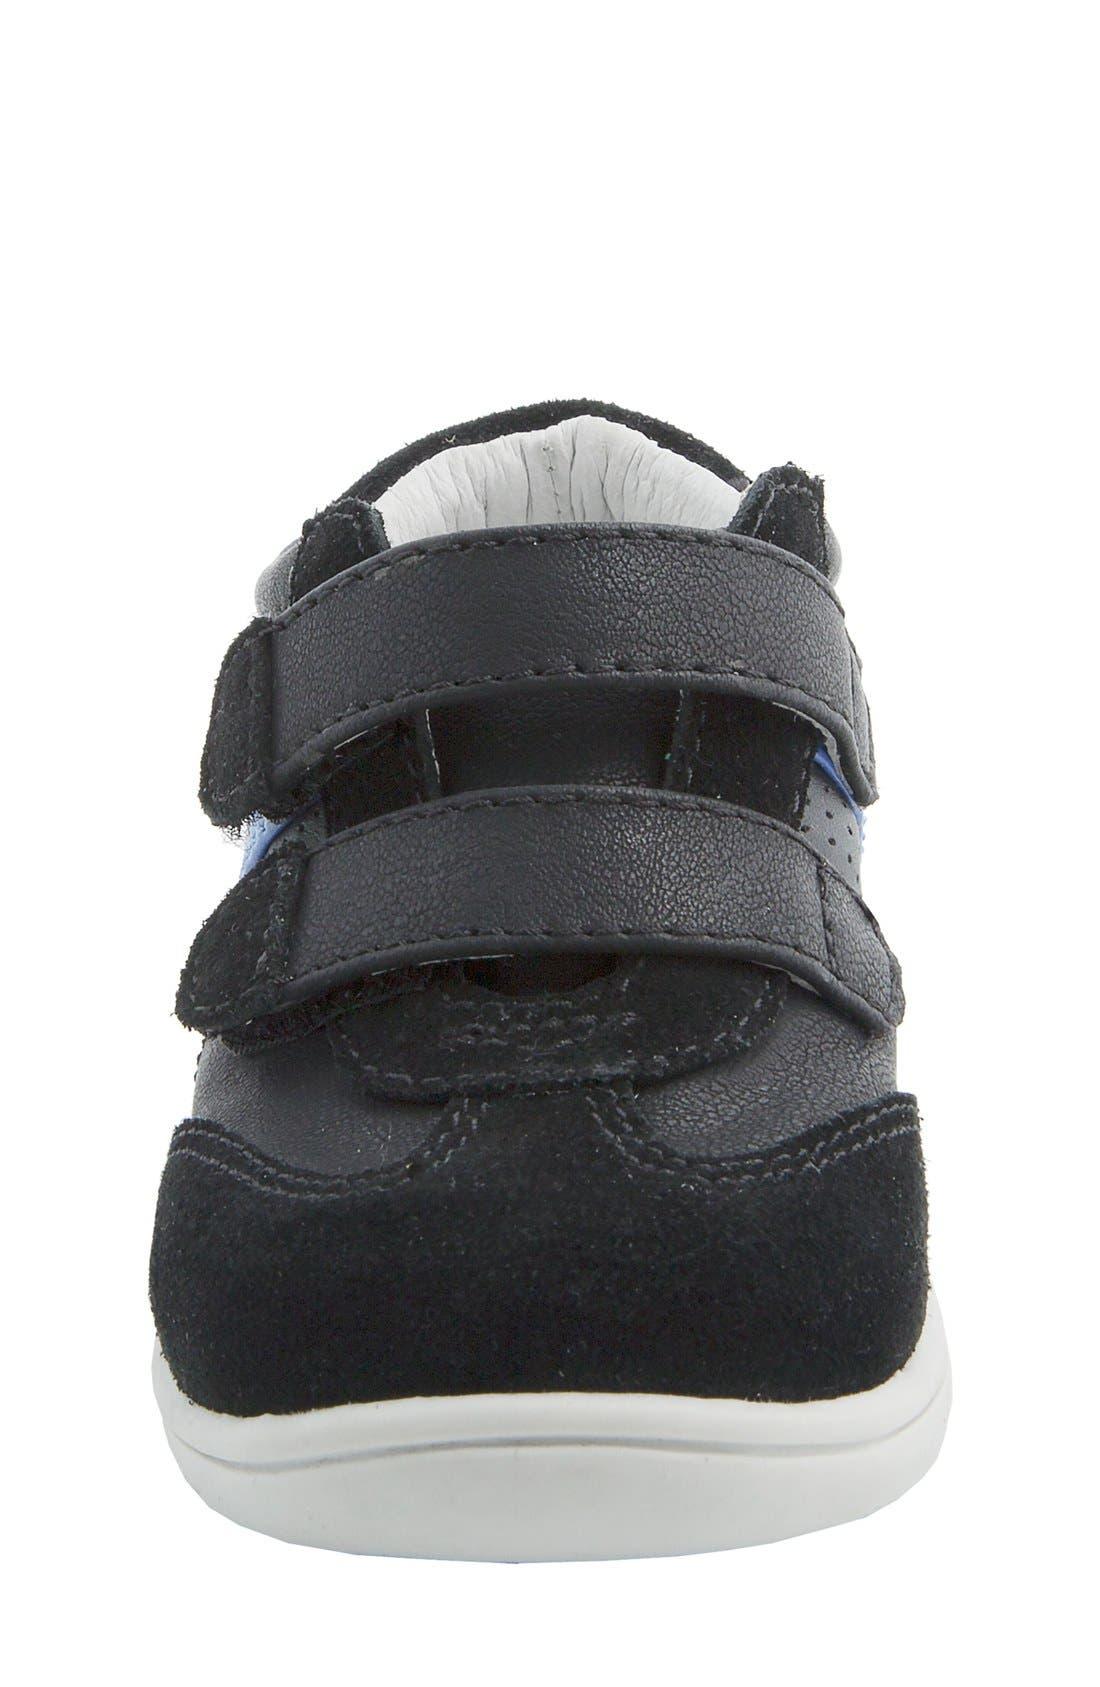 Nina 'Everest' Sneaker,                             Alternate thumbnail 3, color,                             Black Burnished